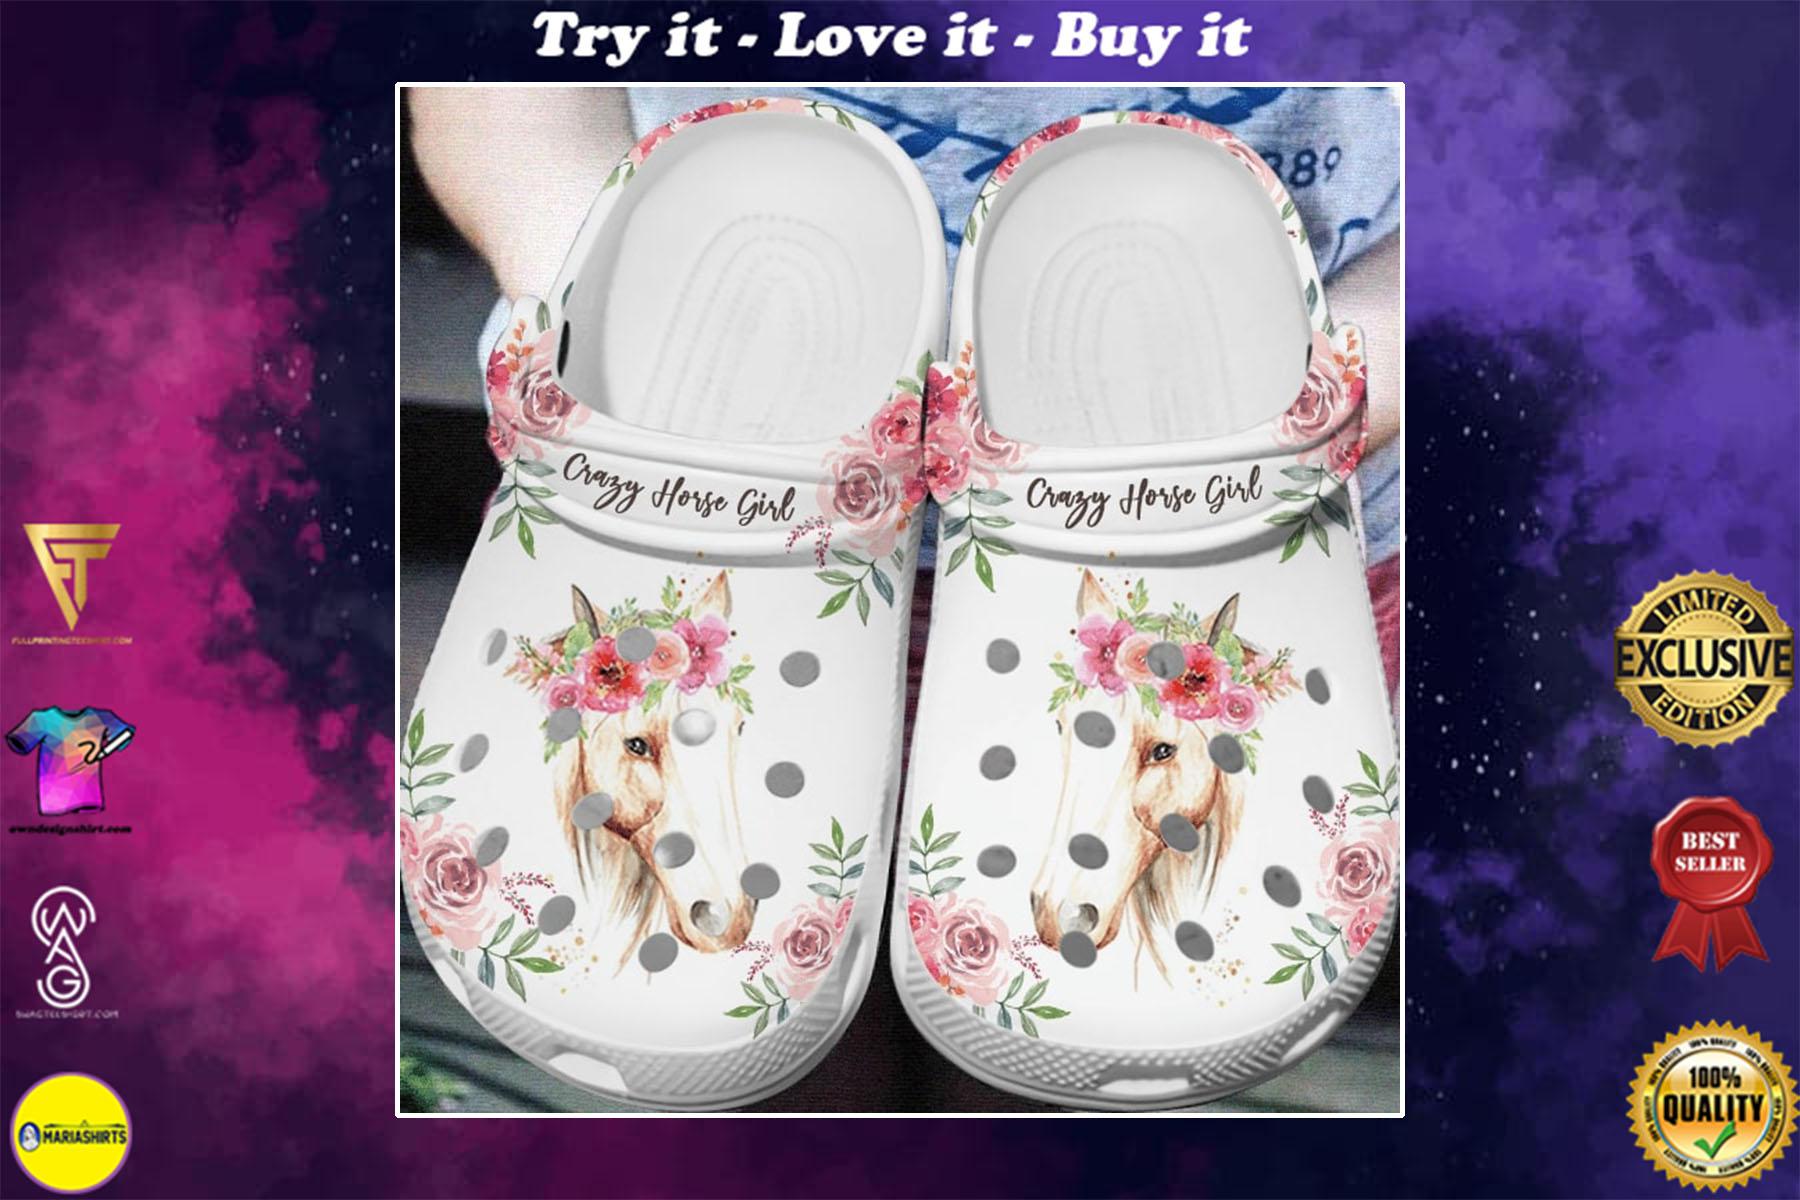 [special edition] floral crazy horse girl crocs shoes - maria